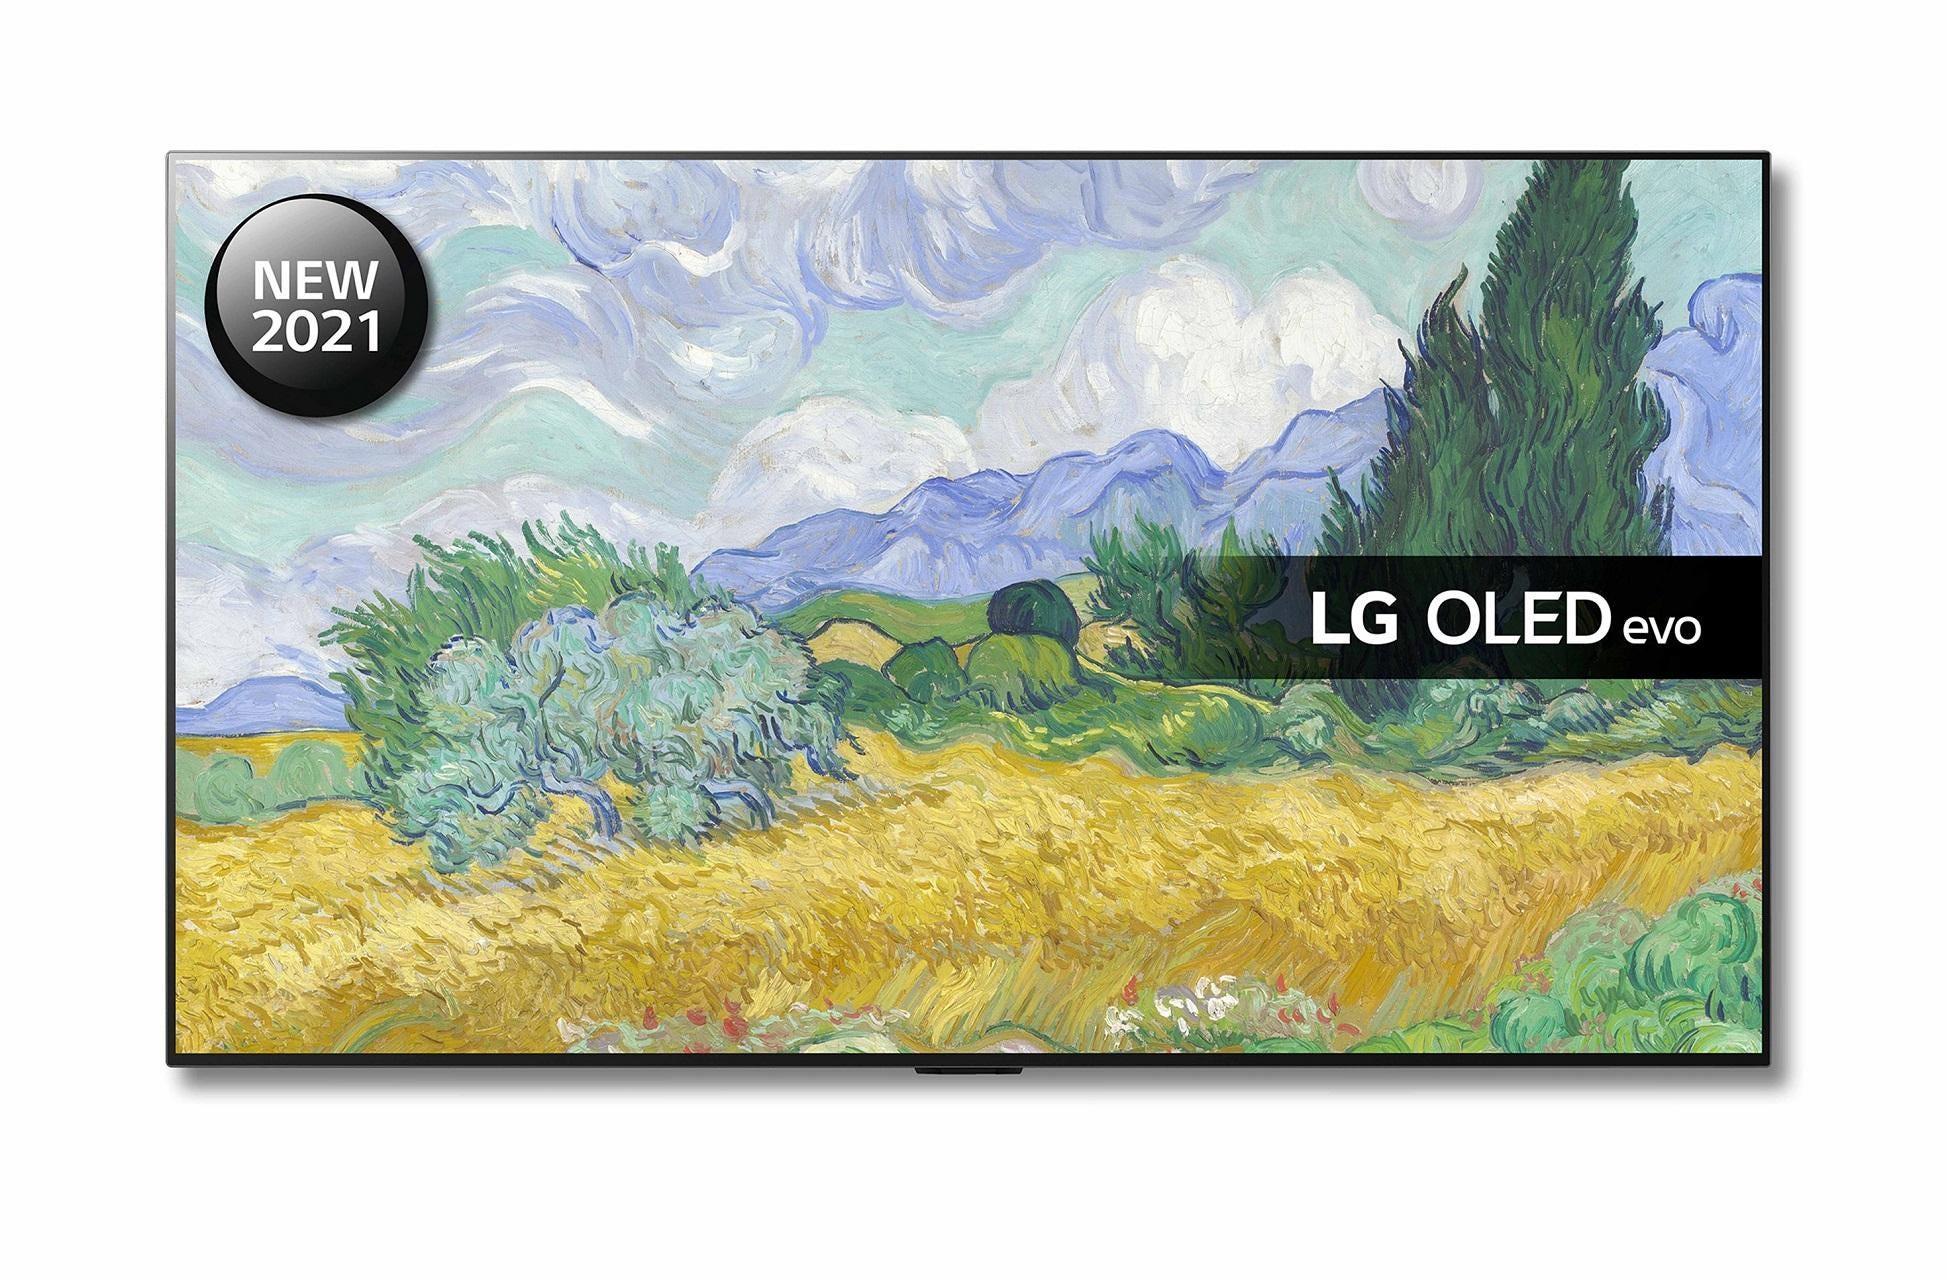 LG OLED65G16LA 65 inch OLED Evo 4K Ultra HD HDR Smart TV Freeview Play Freesat - £2799 @ Richer Sounds